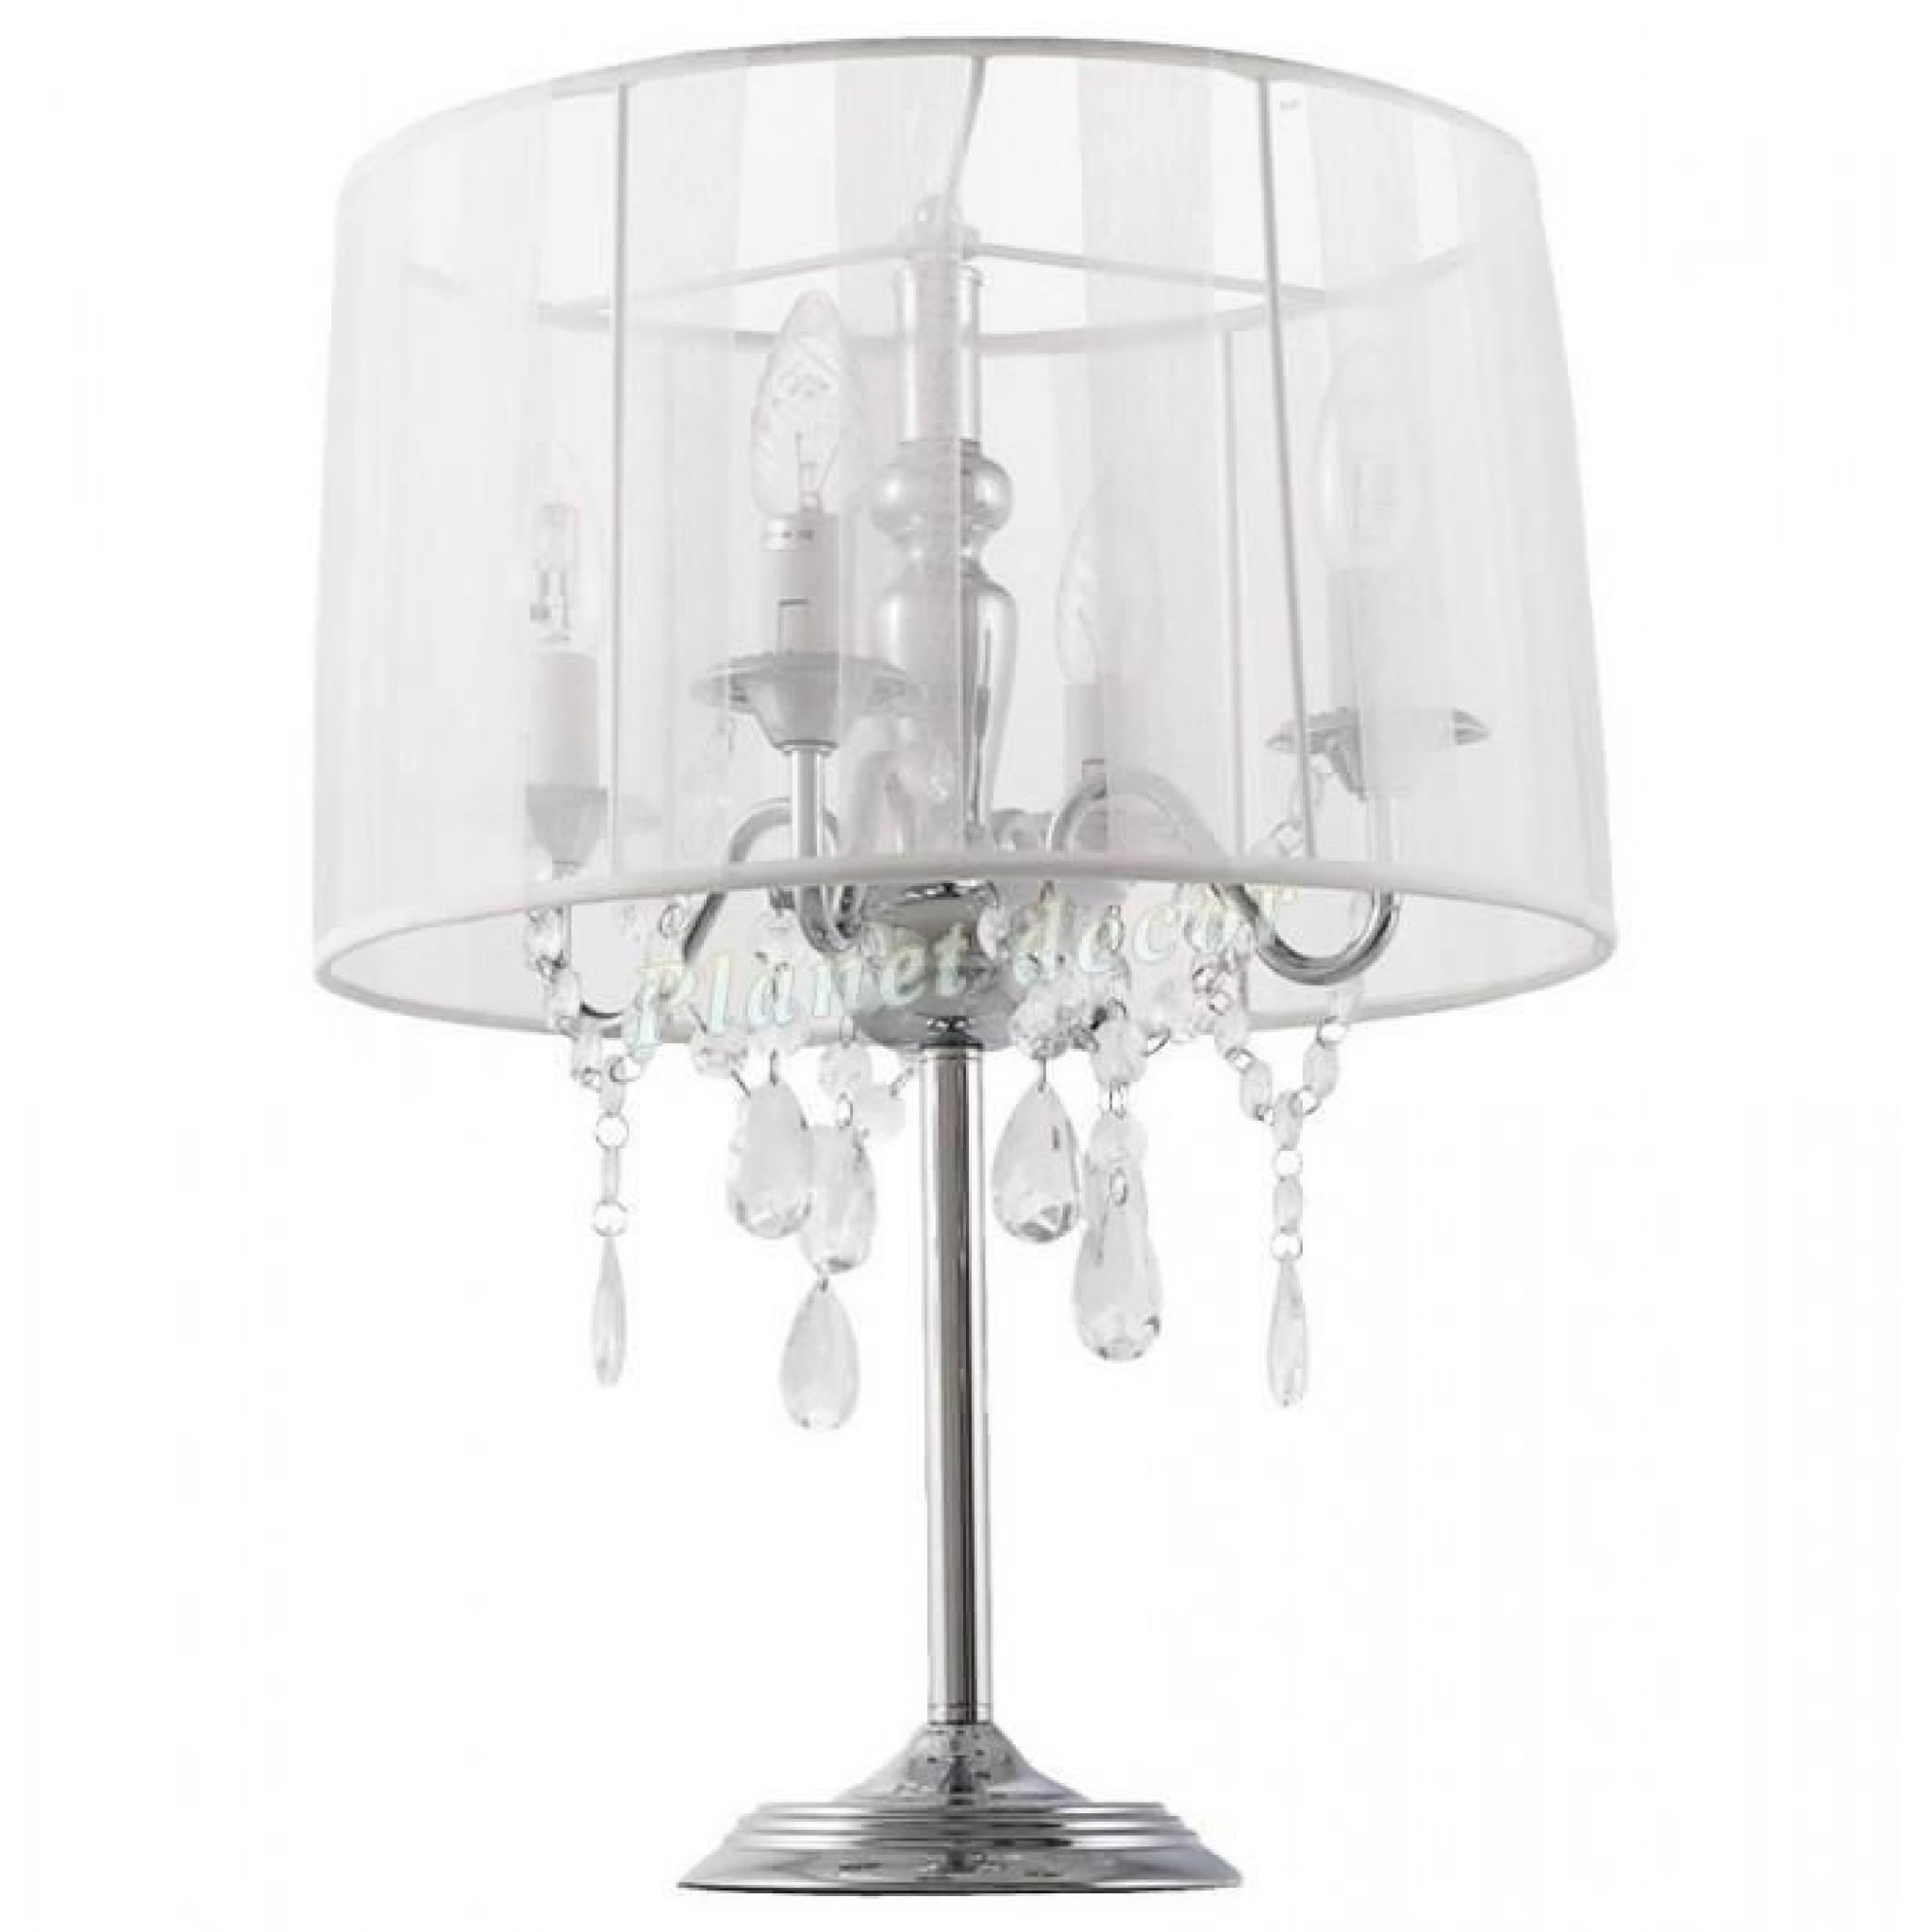 De blanc Lampe Chevet Blanc Chandelier Baroque zVSpMU